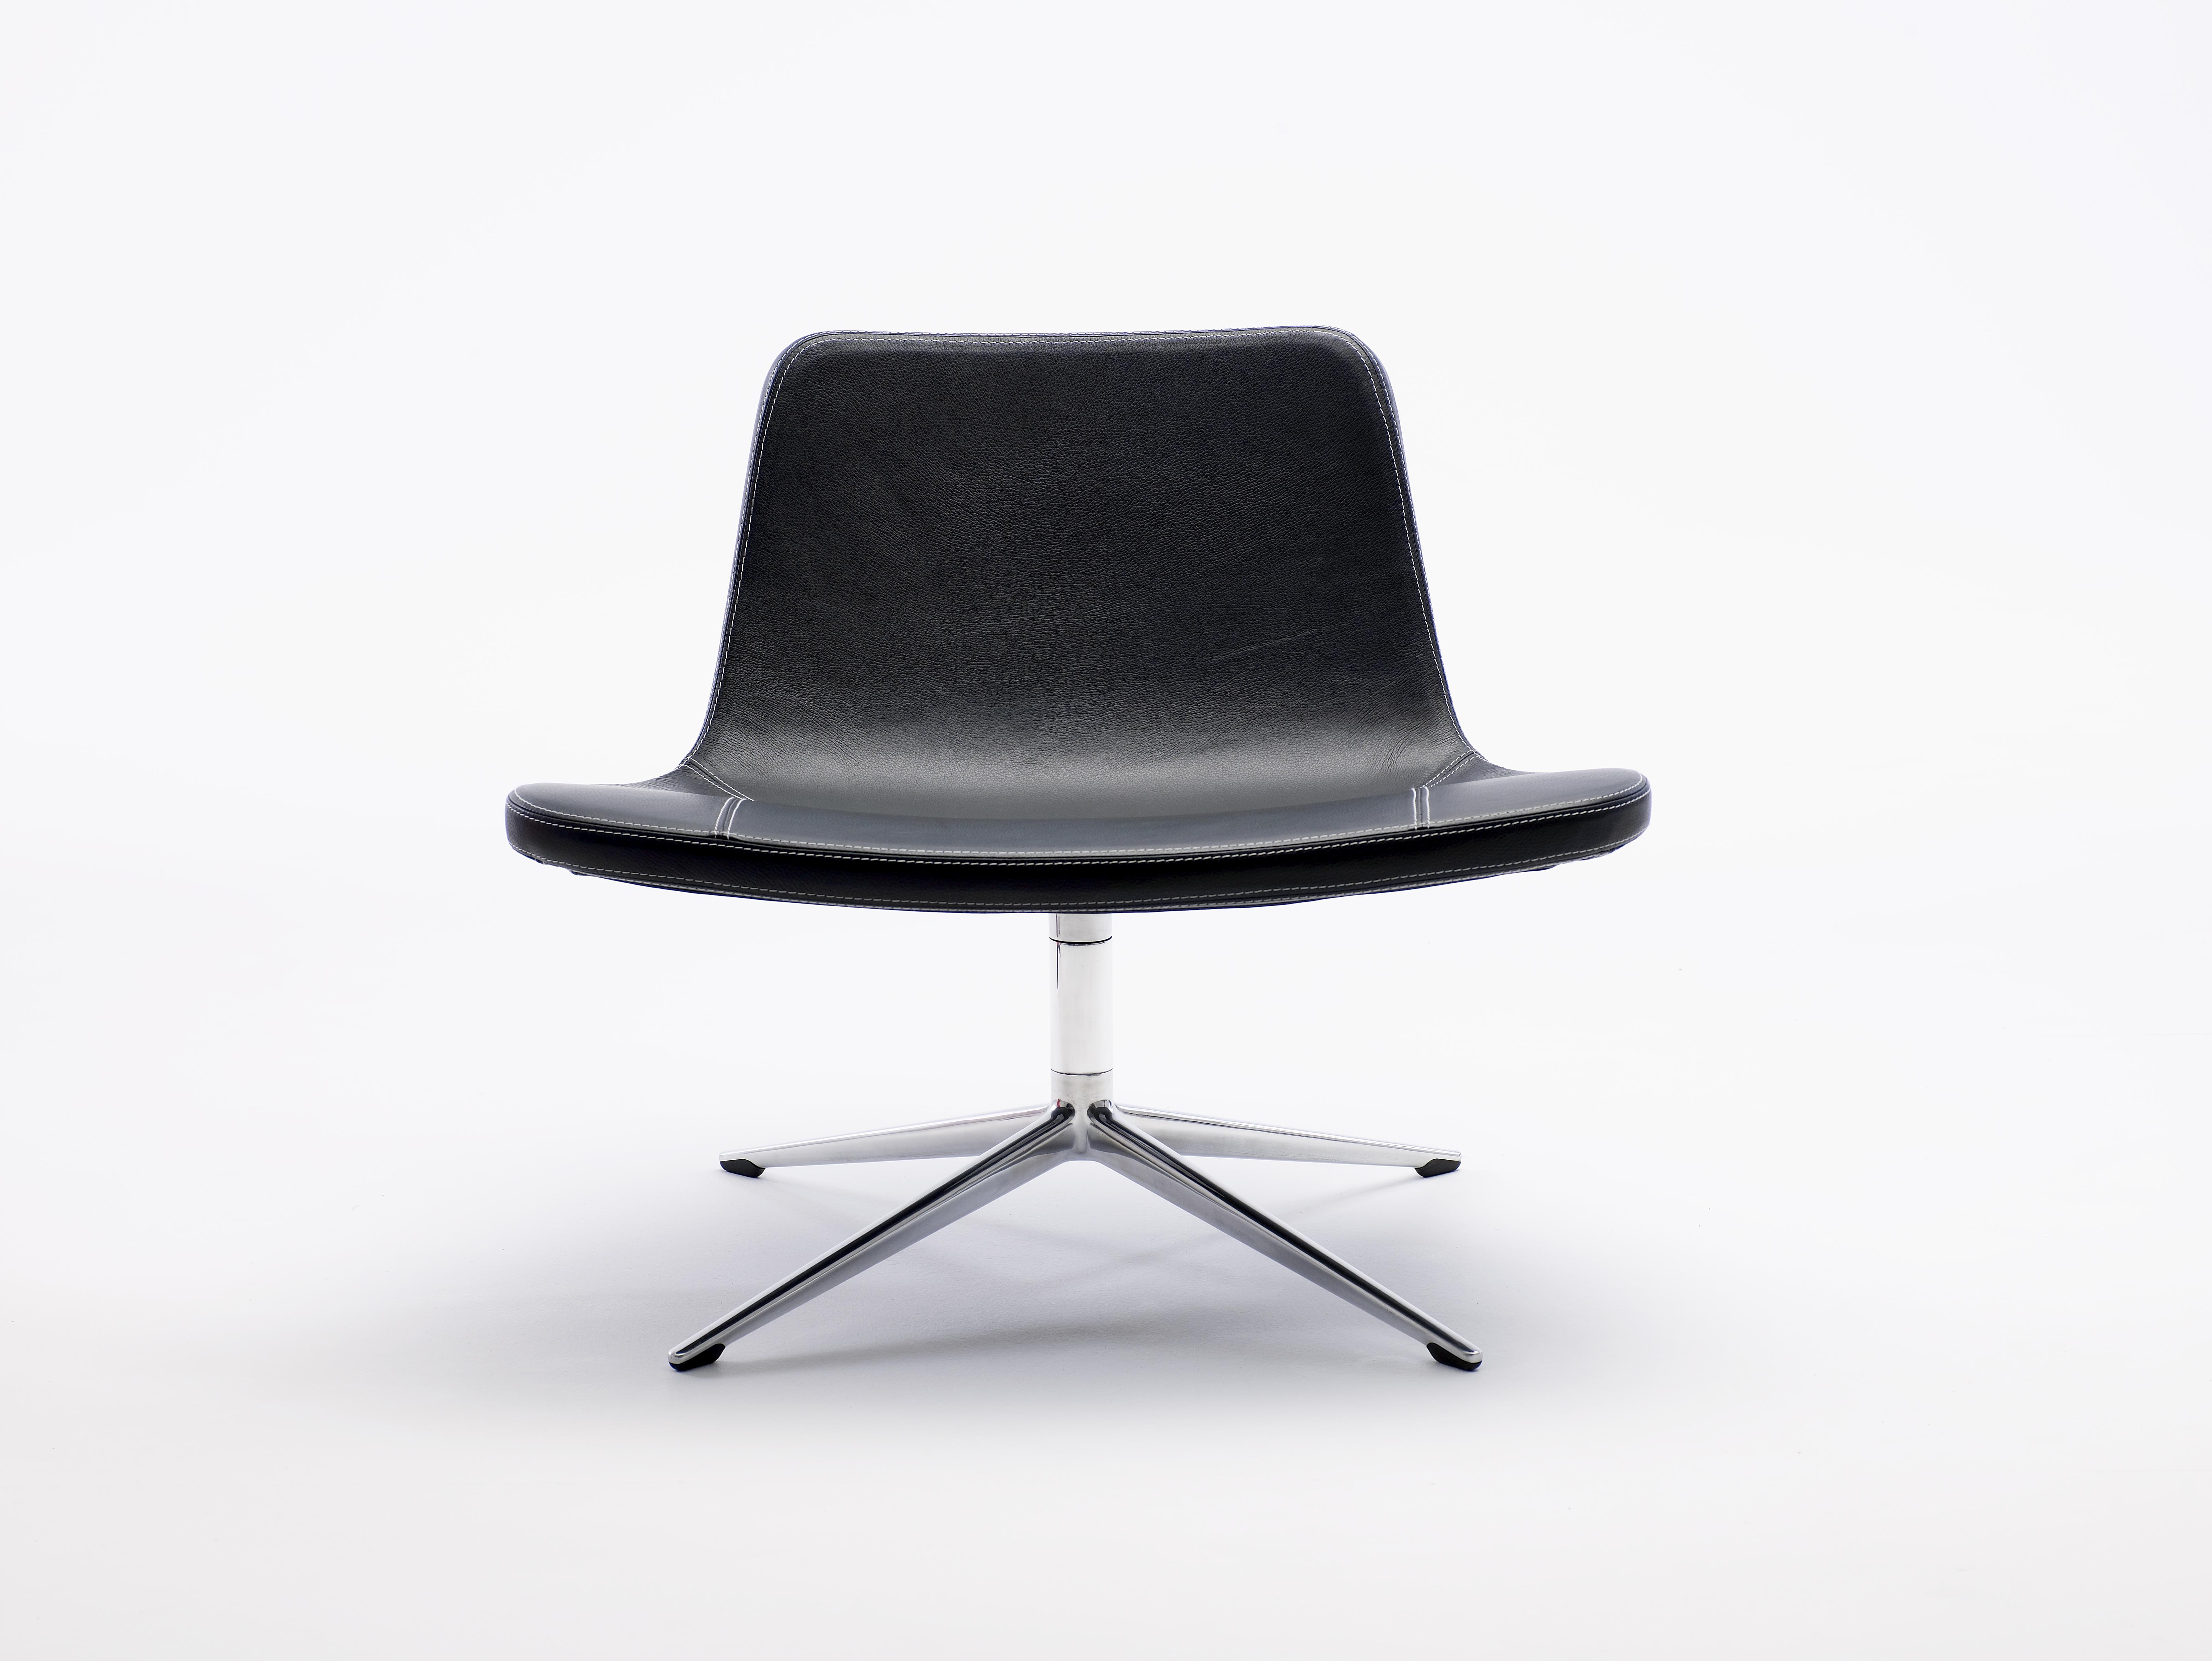 Ray Lounge Chair Swivel Bo Bedre Erhverv